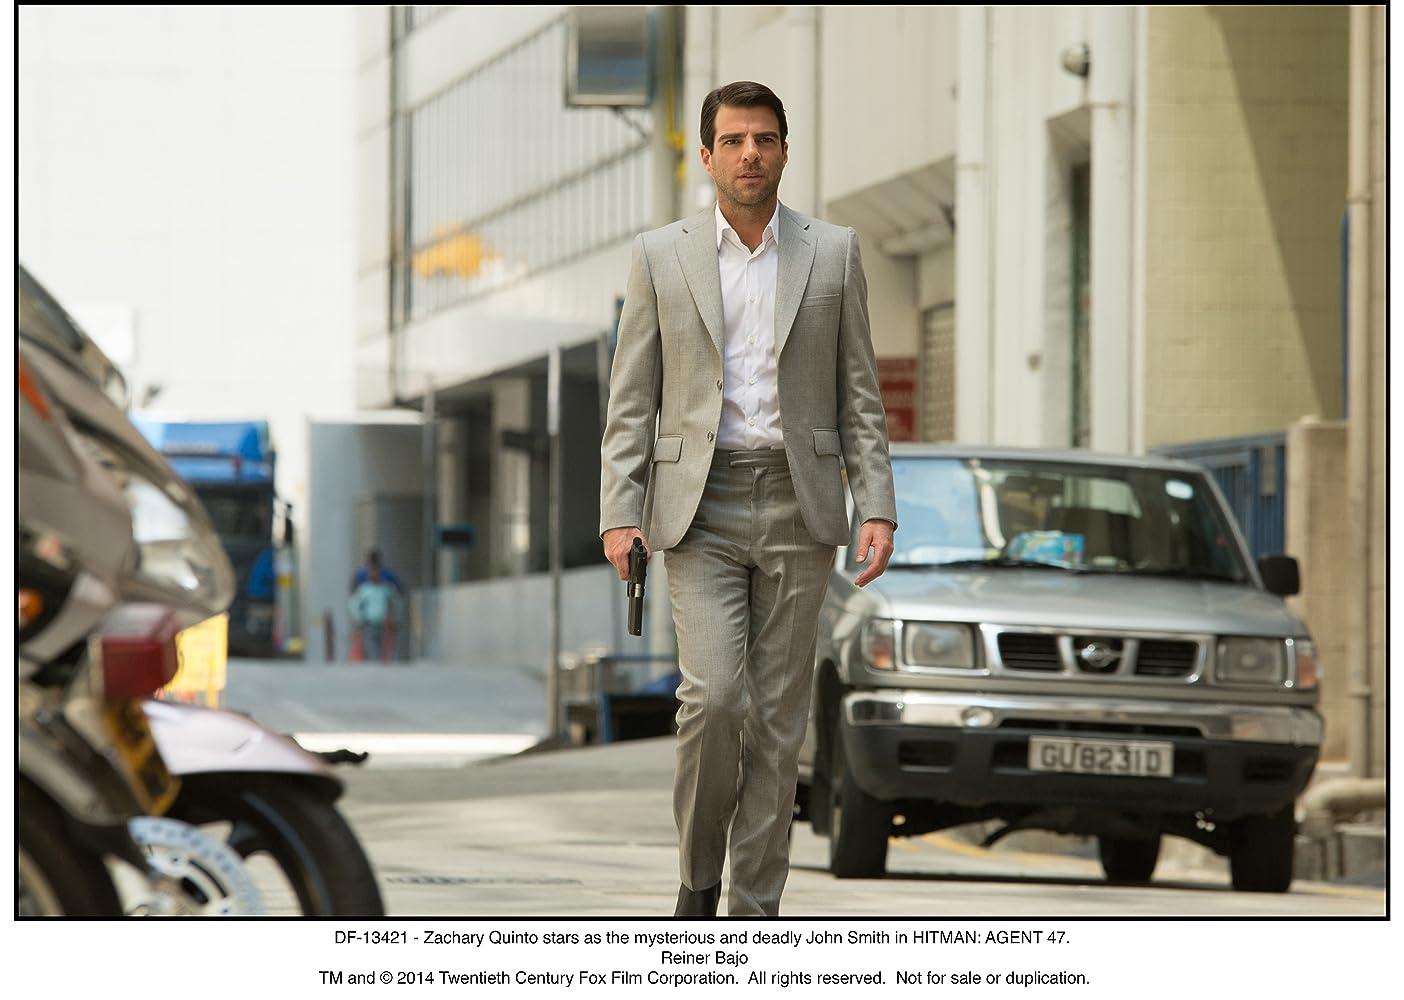 Zachary Quinto in Hitman: Agent 47 (2015)